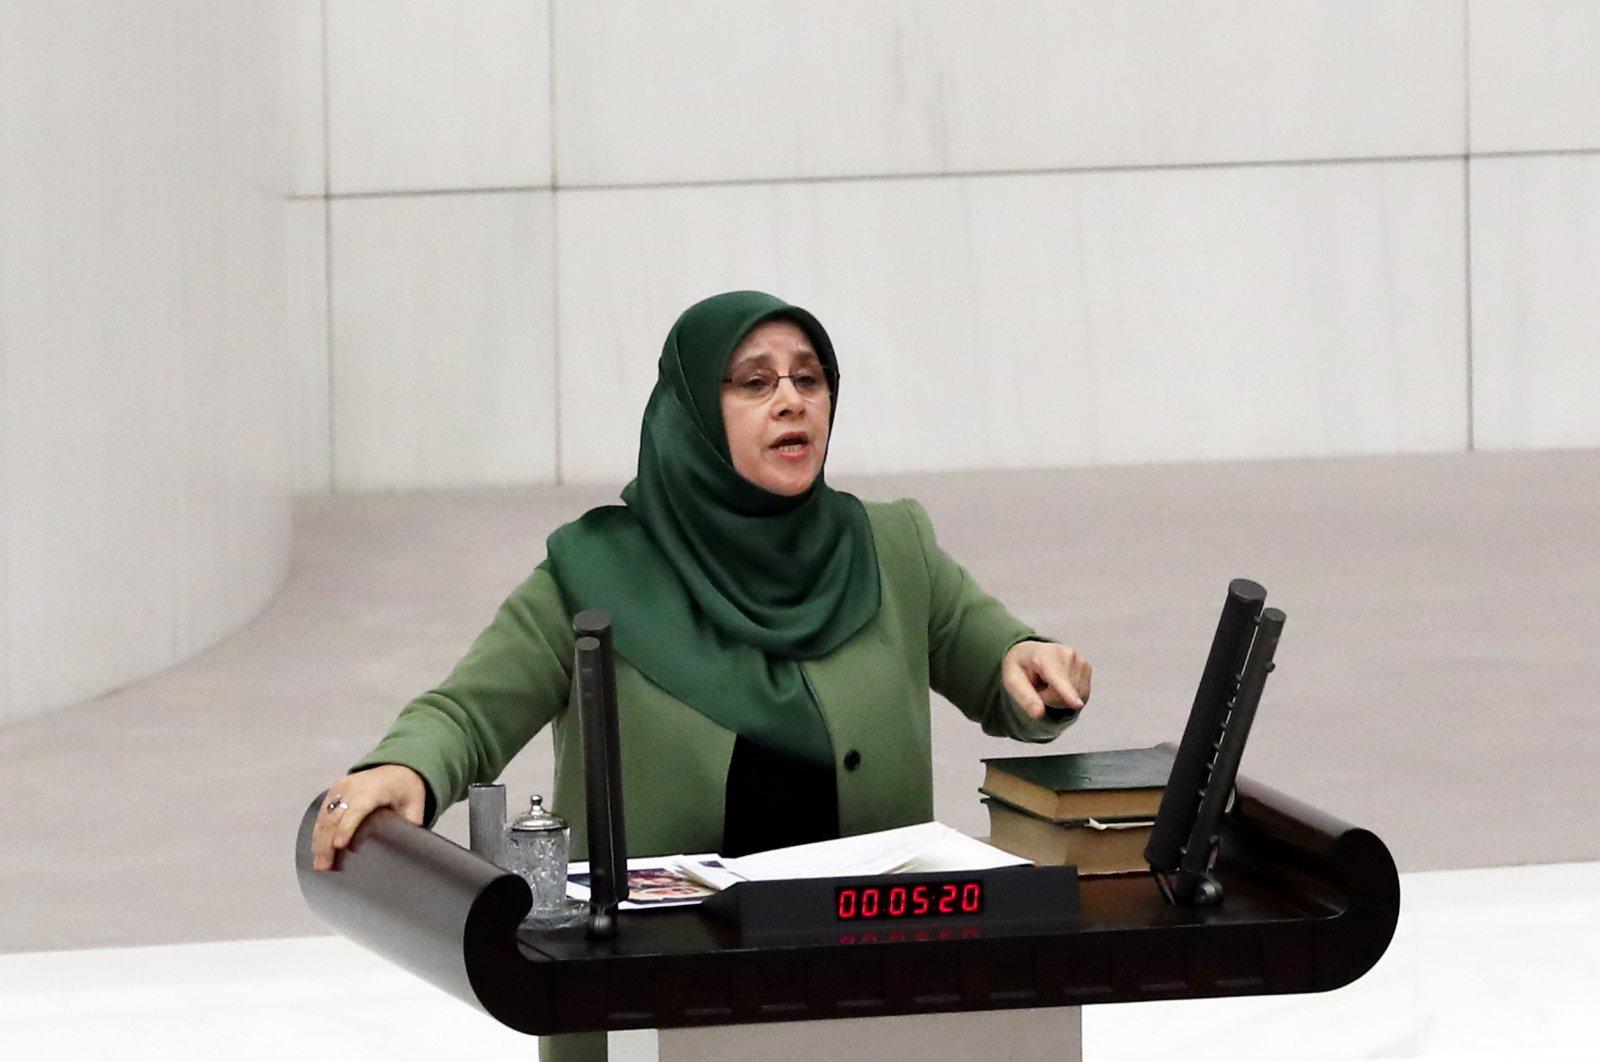 HDP Istanbul Lawmaker Hüda Kaya speaks at the Turkish Parliament on June 4, 2019. (Sabah File Photo)